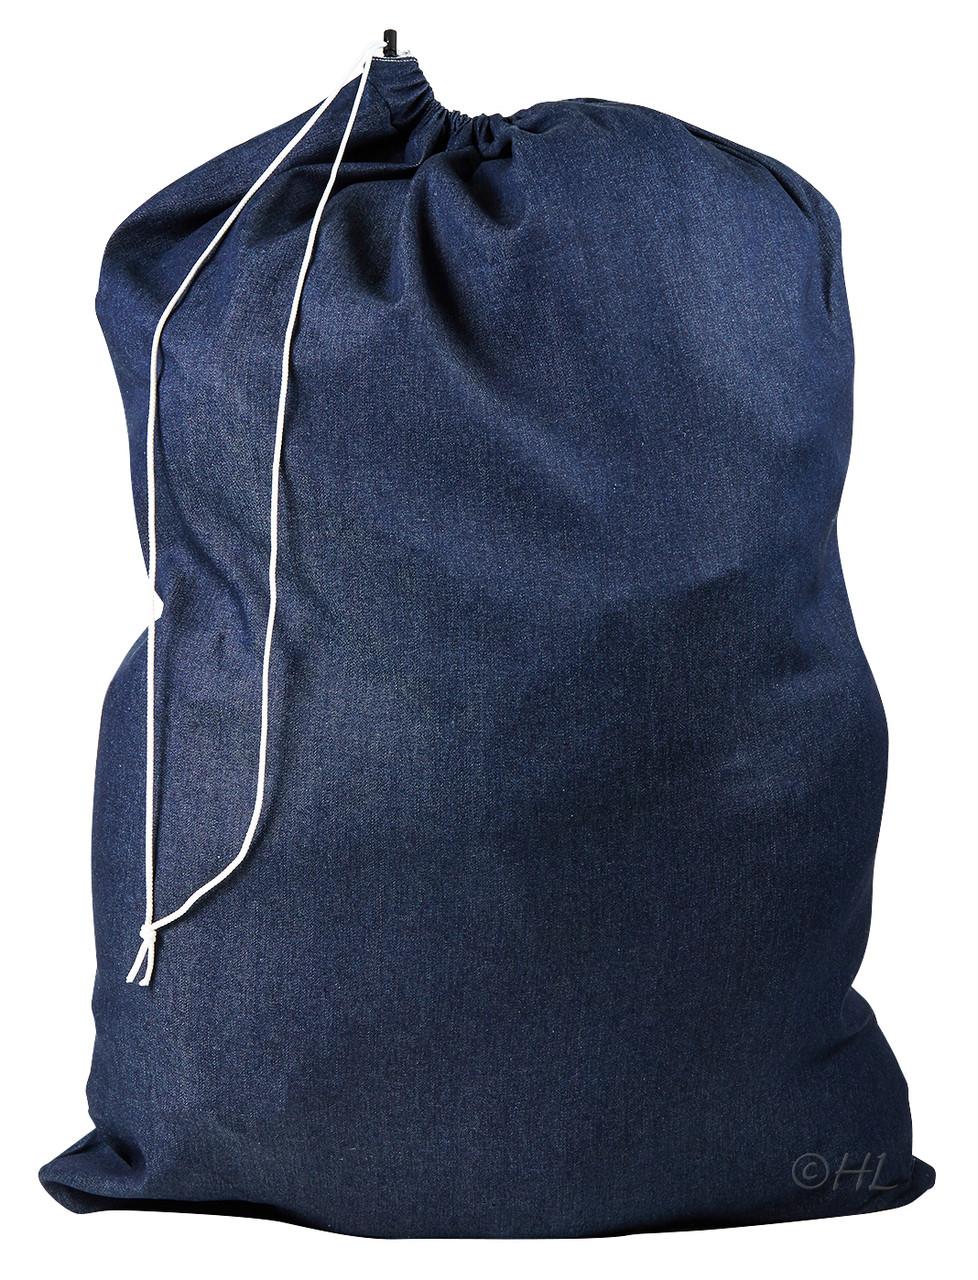 Denim laundry bag drawstring closure 30 x 40 - X laundry bags ...